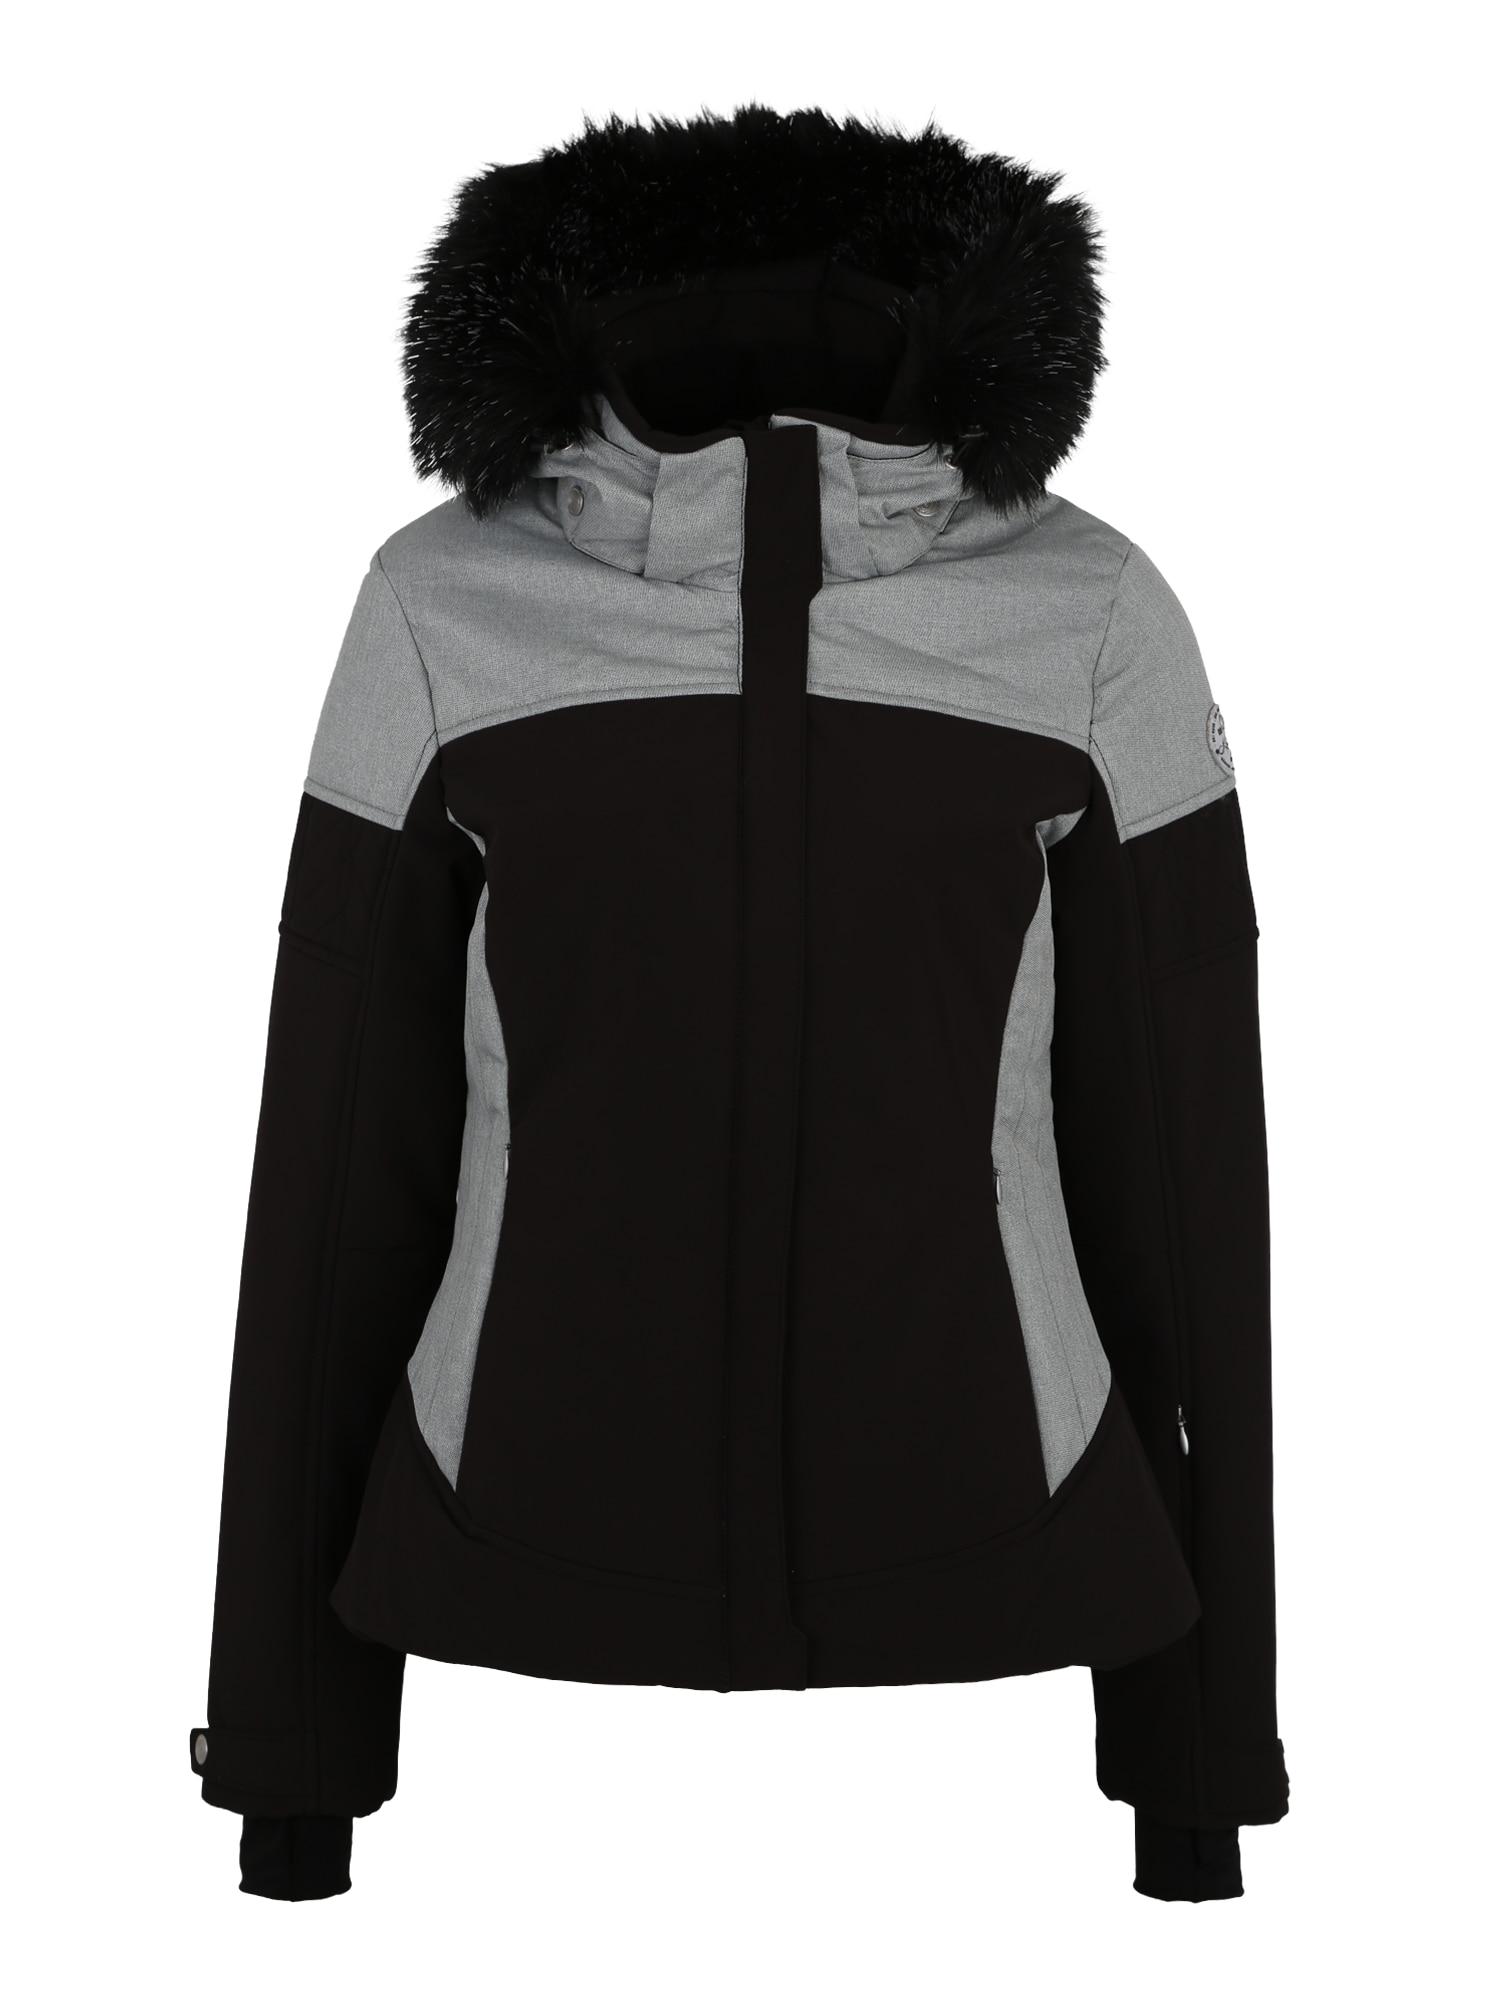 Sportovní bunda Camira šedá černá KILLTEC